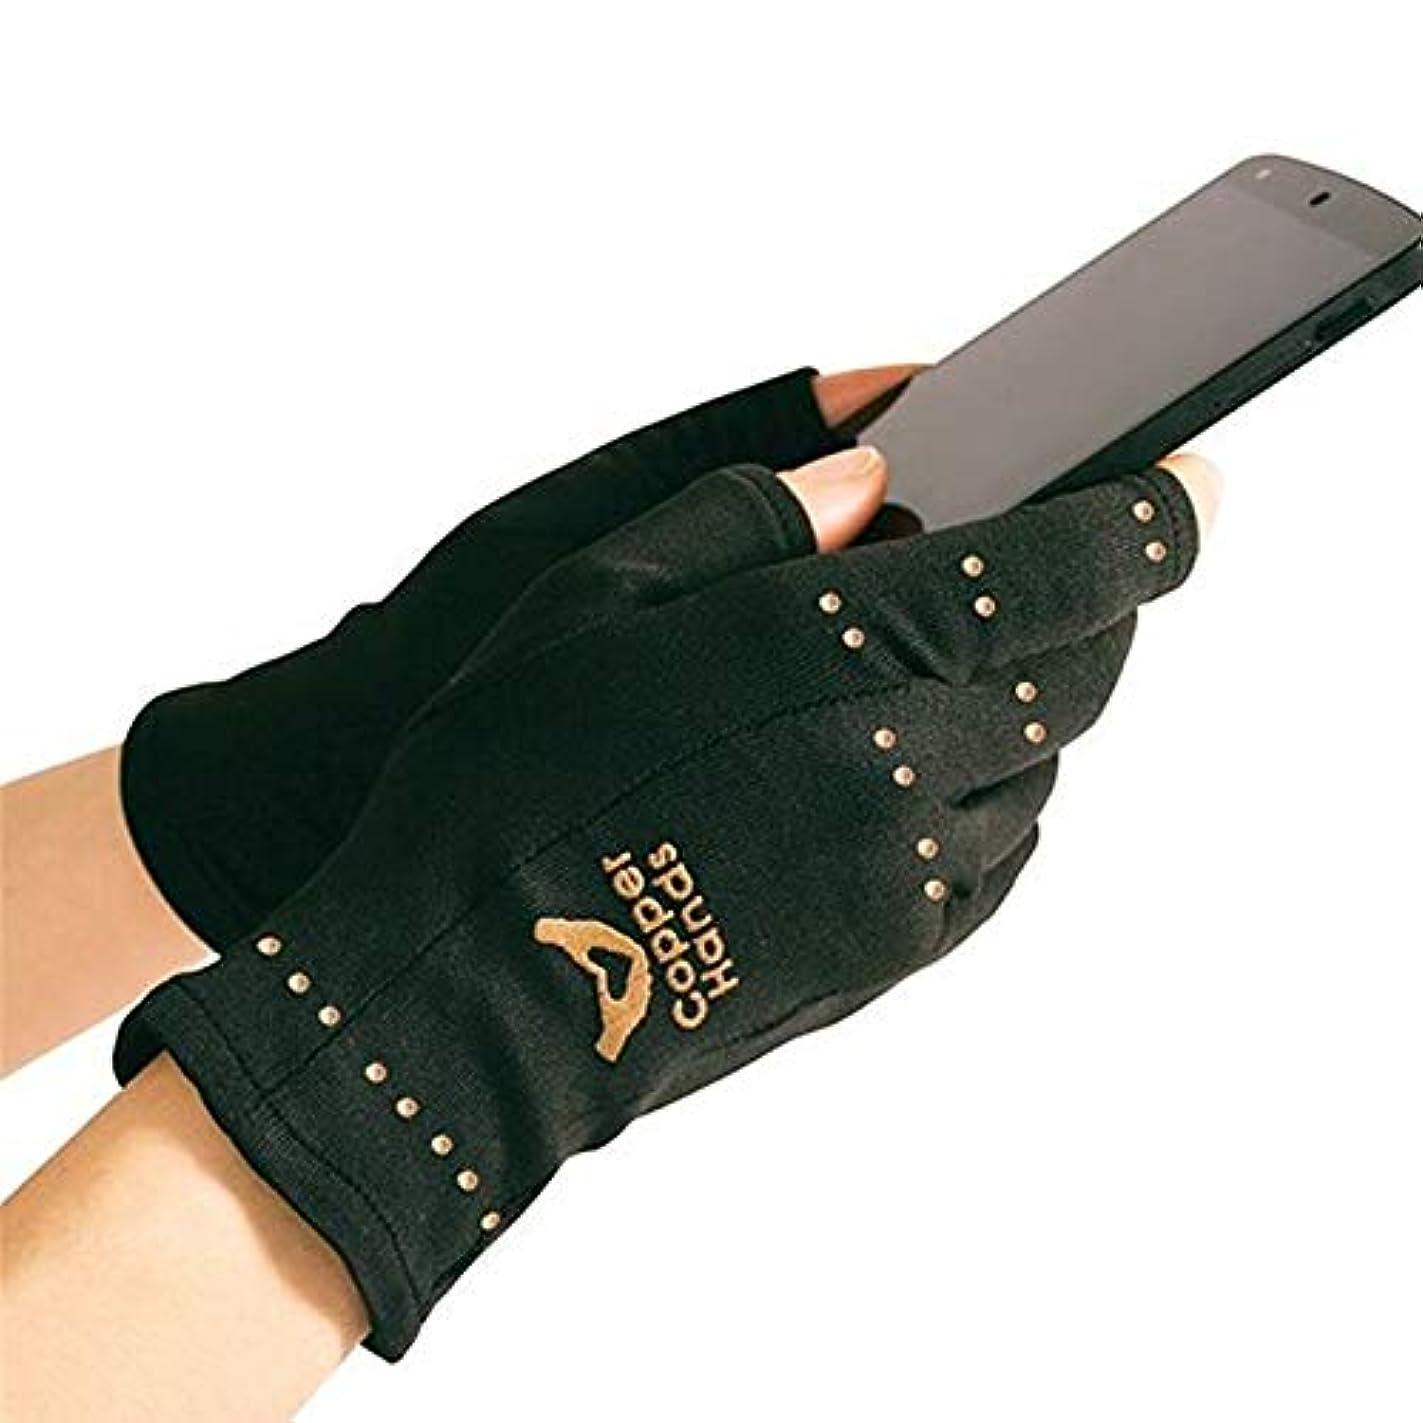 実現可能性ミスペンド革新hapler 磁気療法手袋 磁気手袋 通気性 抗浮腫 関節炎手袋 関節炎着圧手袋 1ペア指なし手袋 関節炎解消 リウマチ性手痛 健康増進療法 手痛緩和手袋 男女通気性良い